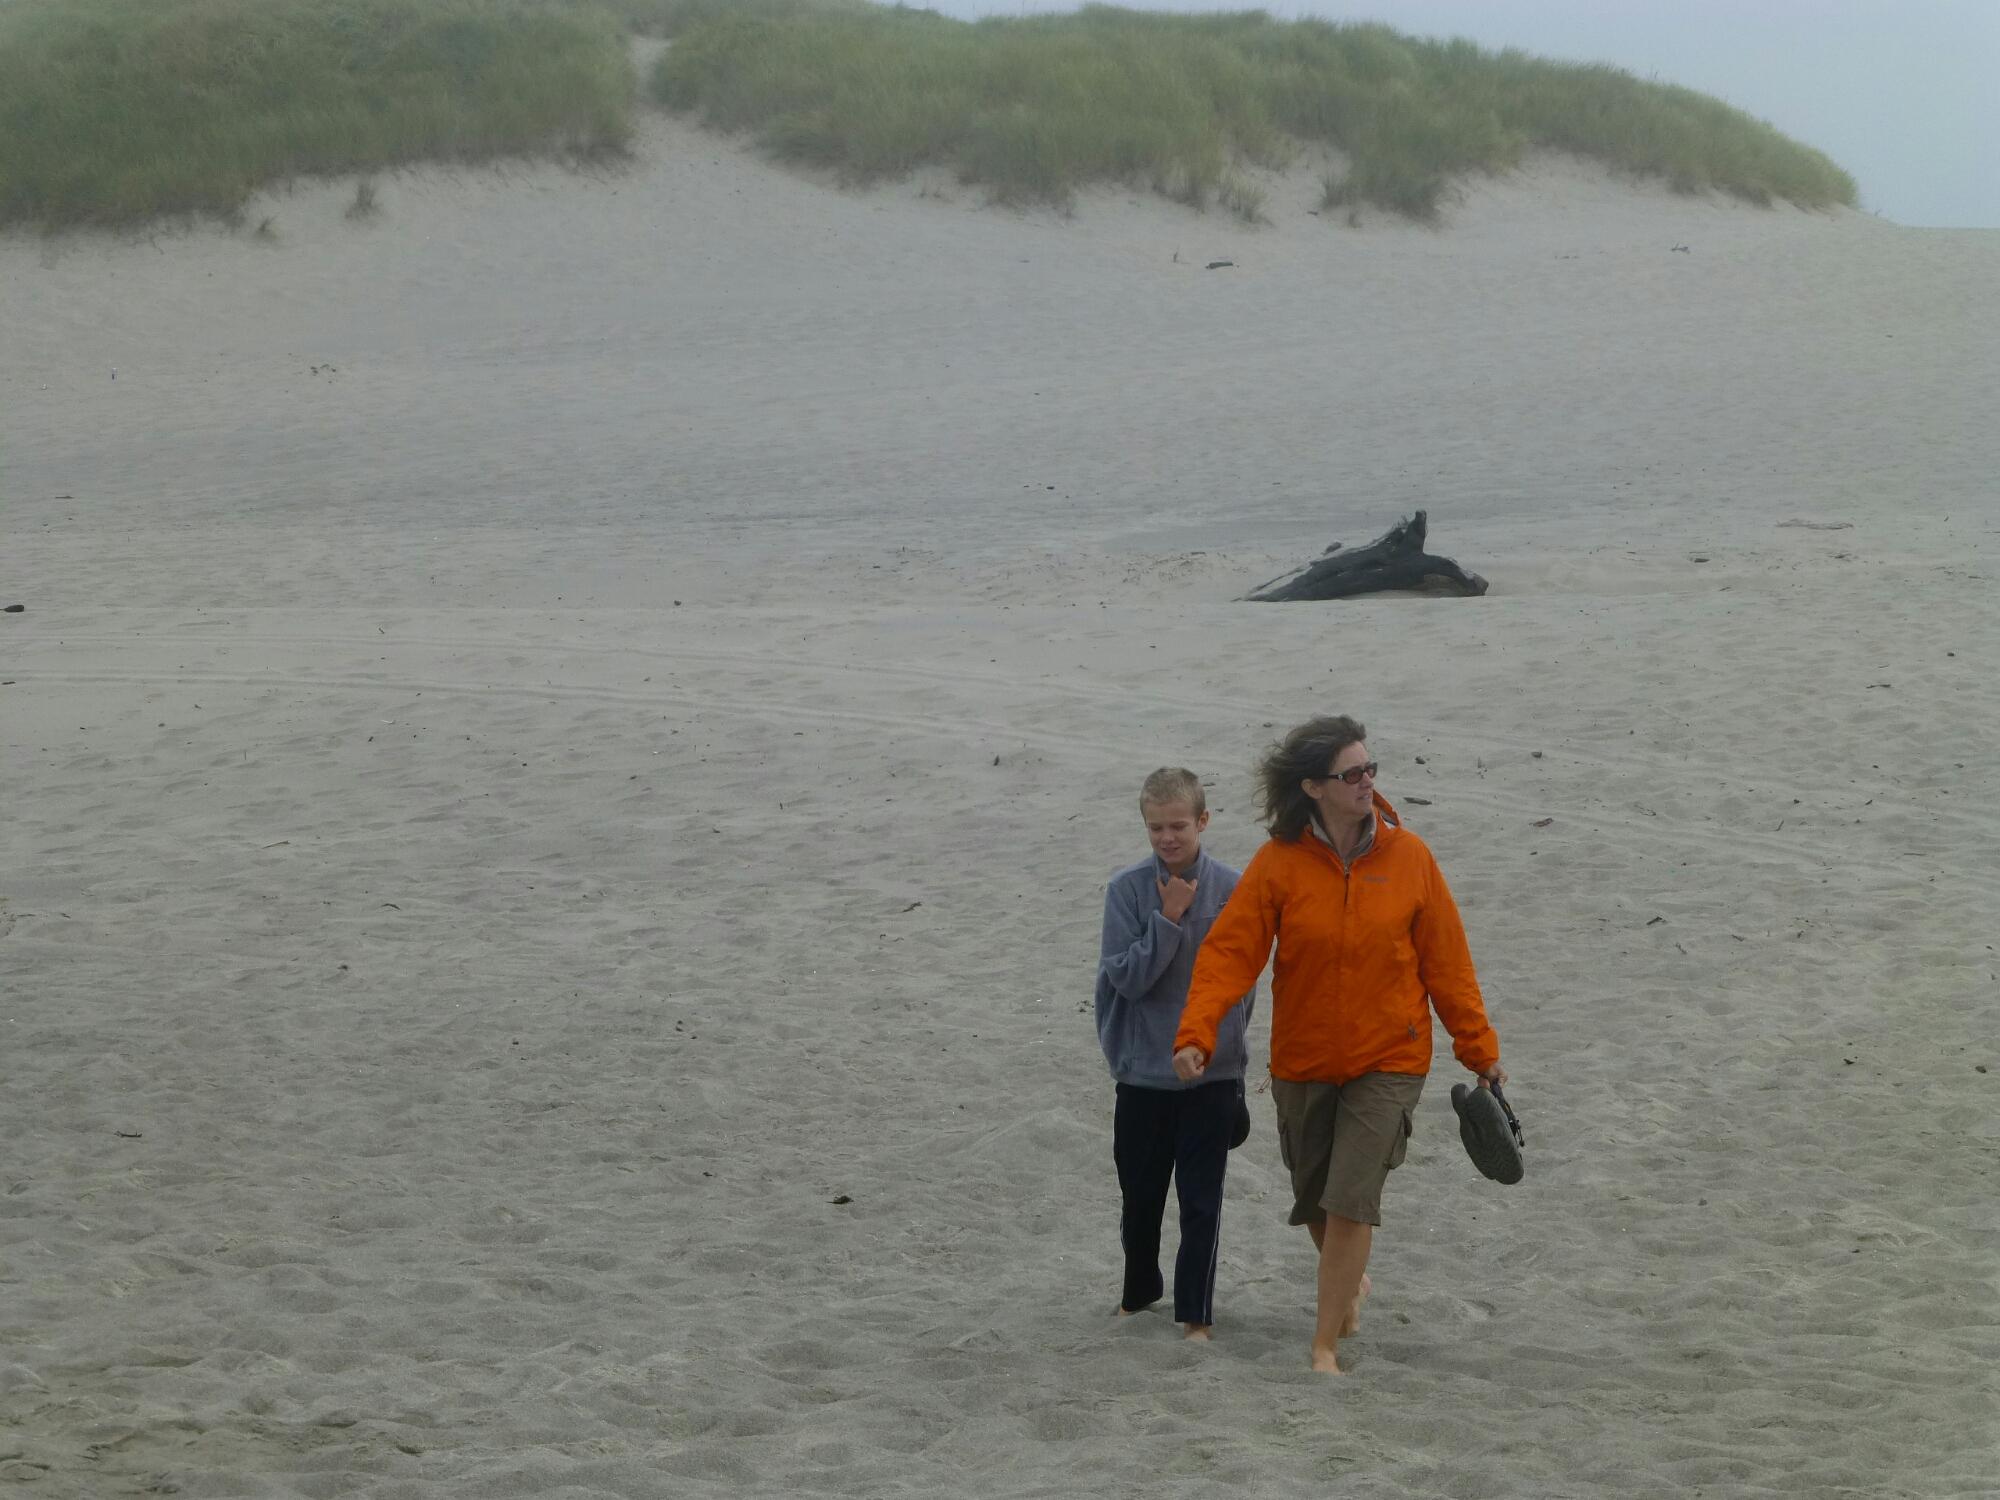 Crash course how meet men beach